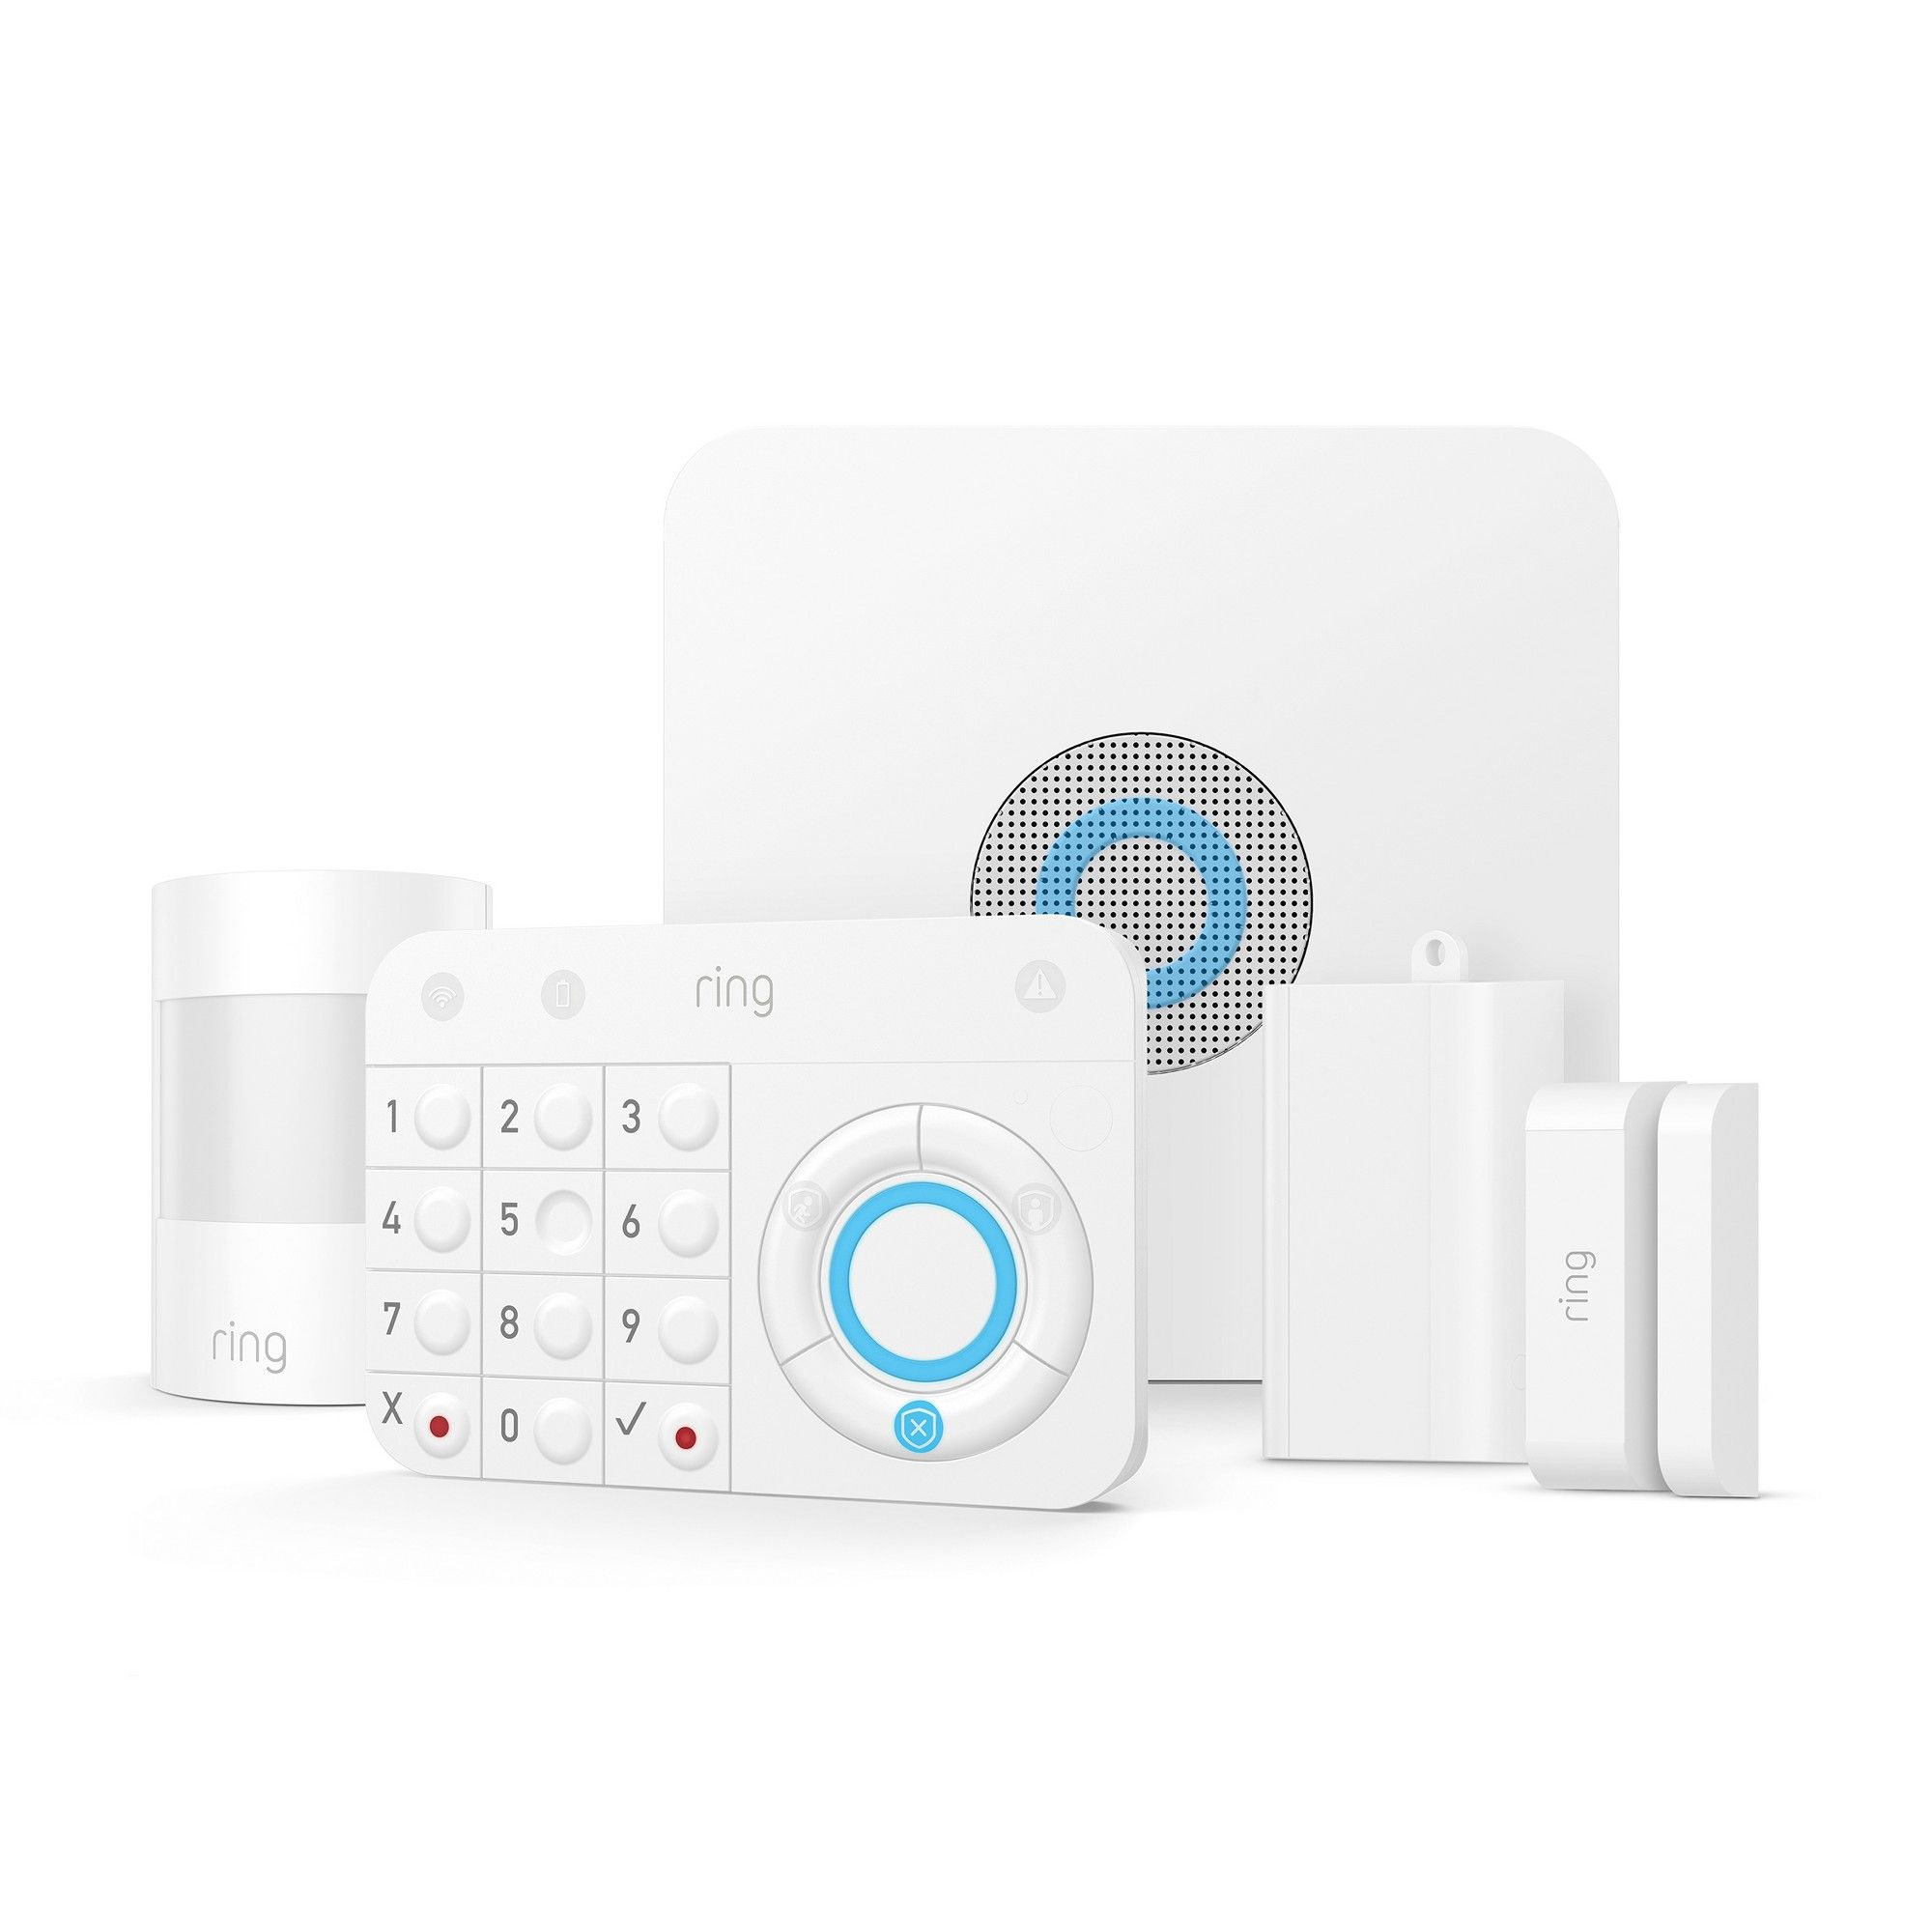 Ring Alarm Starter Kit Wireless Home Security Systems Diy Home Security Smart Home Security